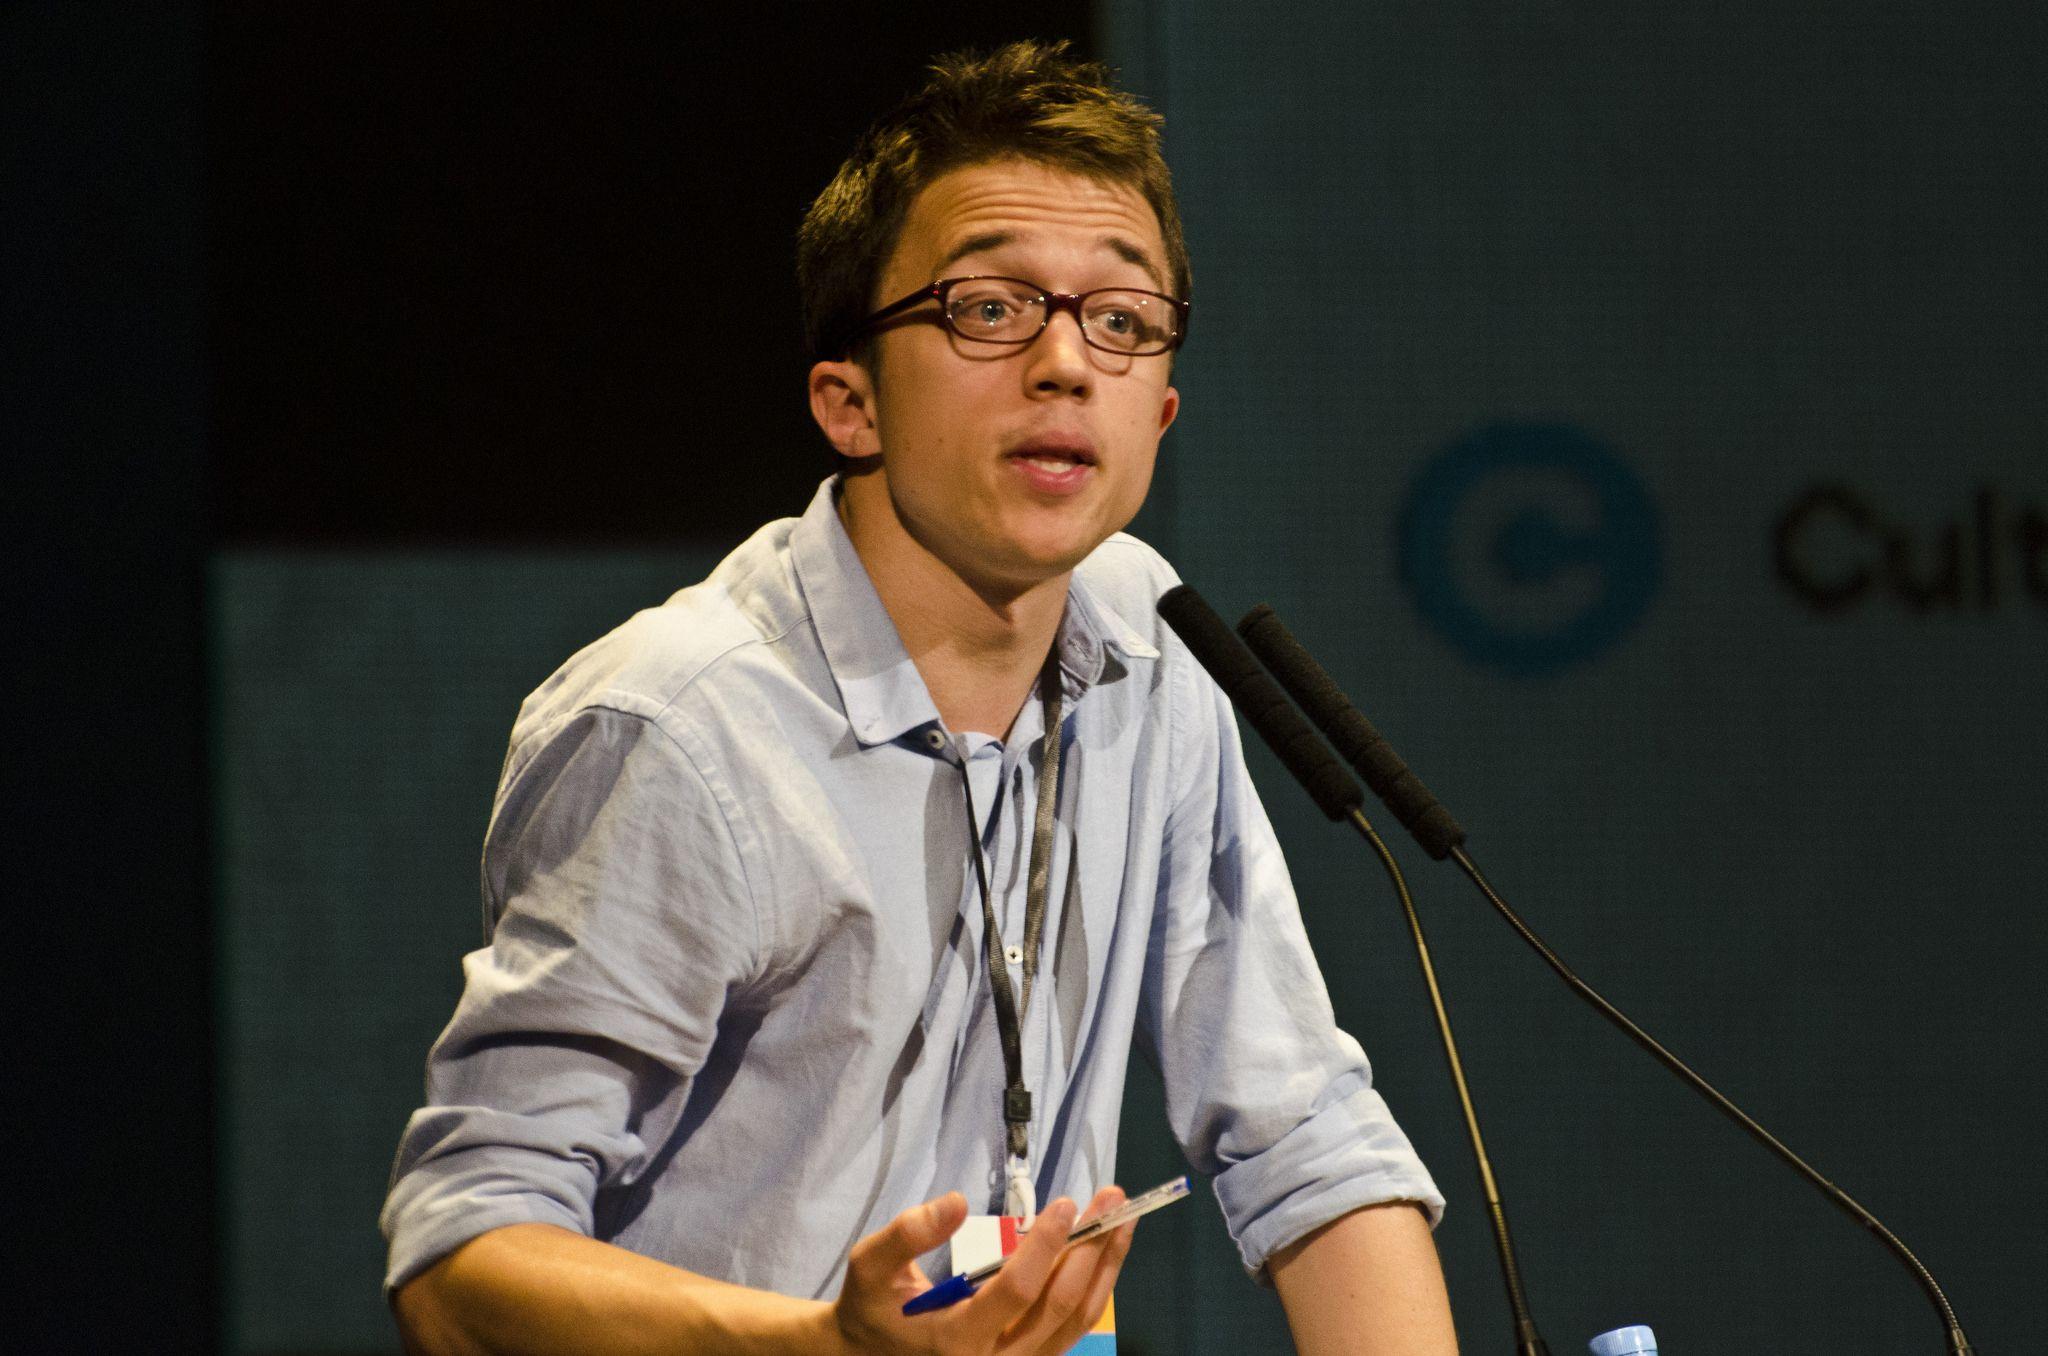 El secretario de Política de Podemos, Iñigo Errejón.